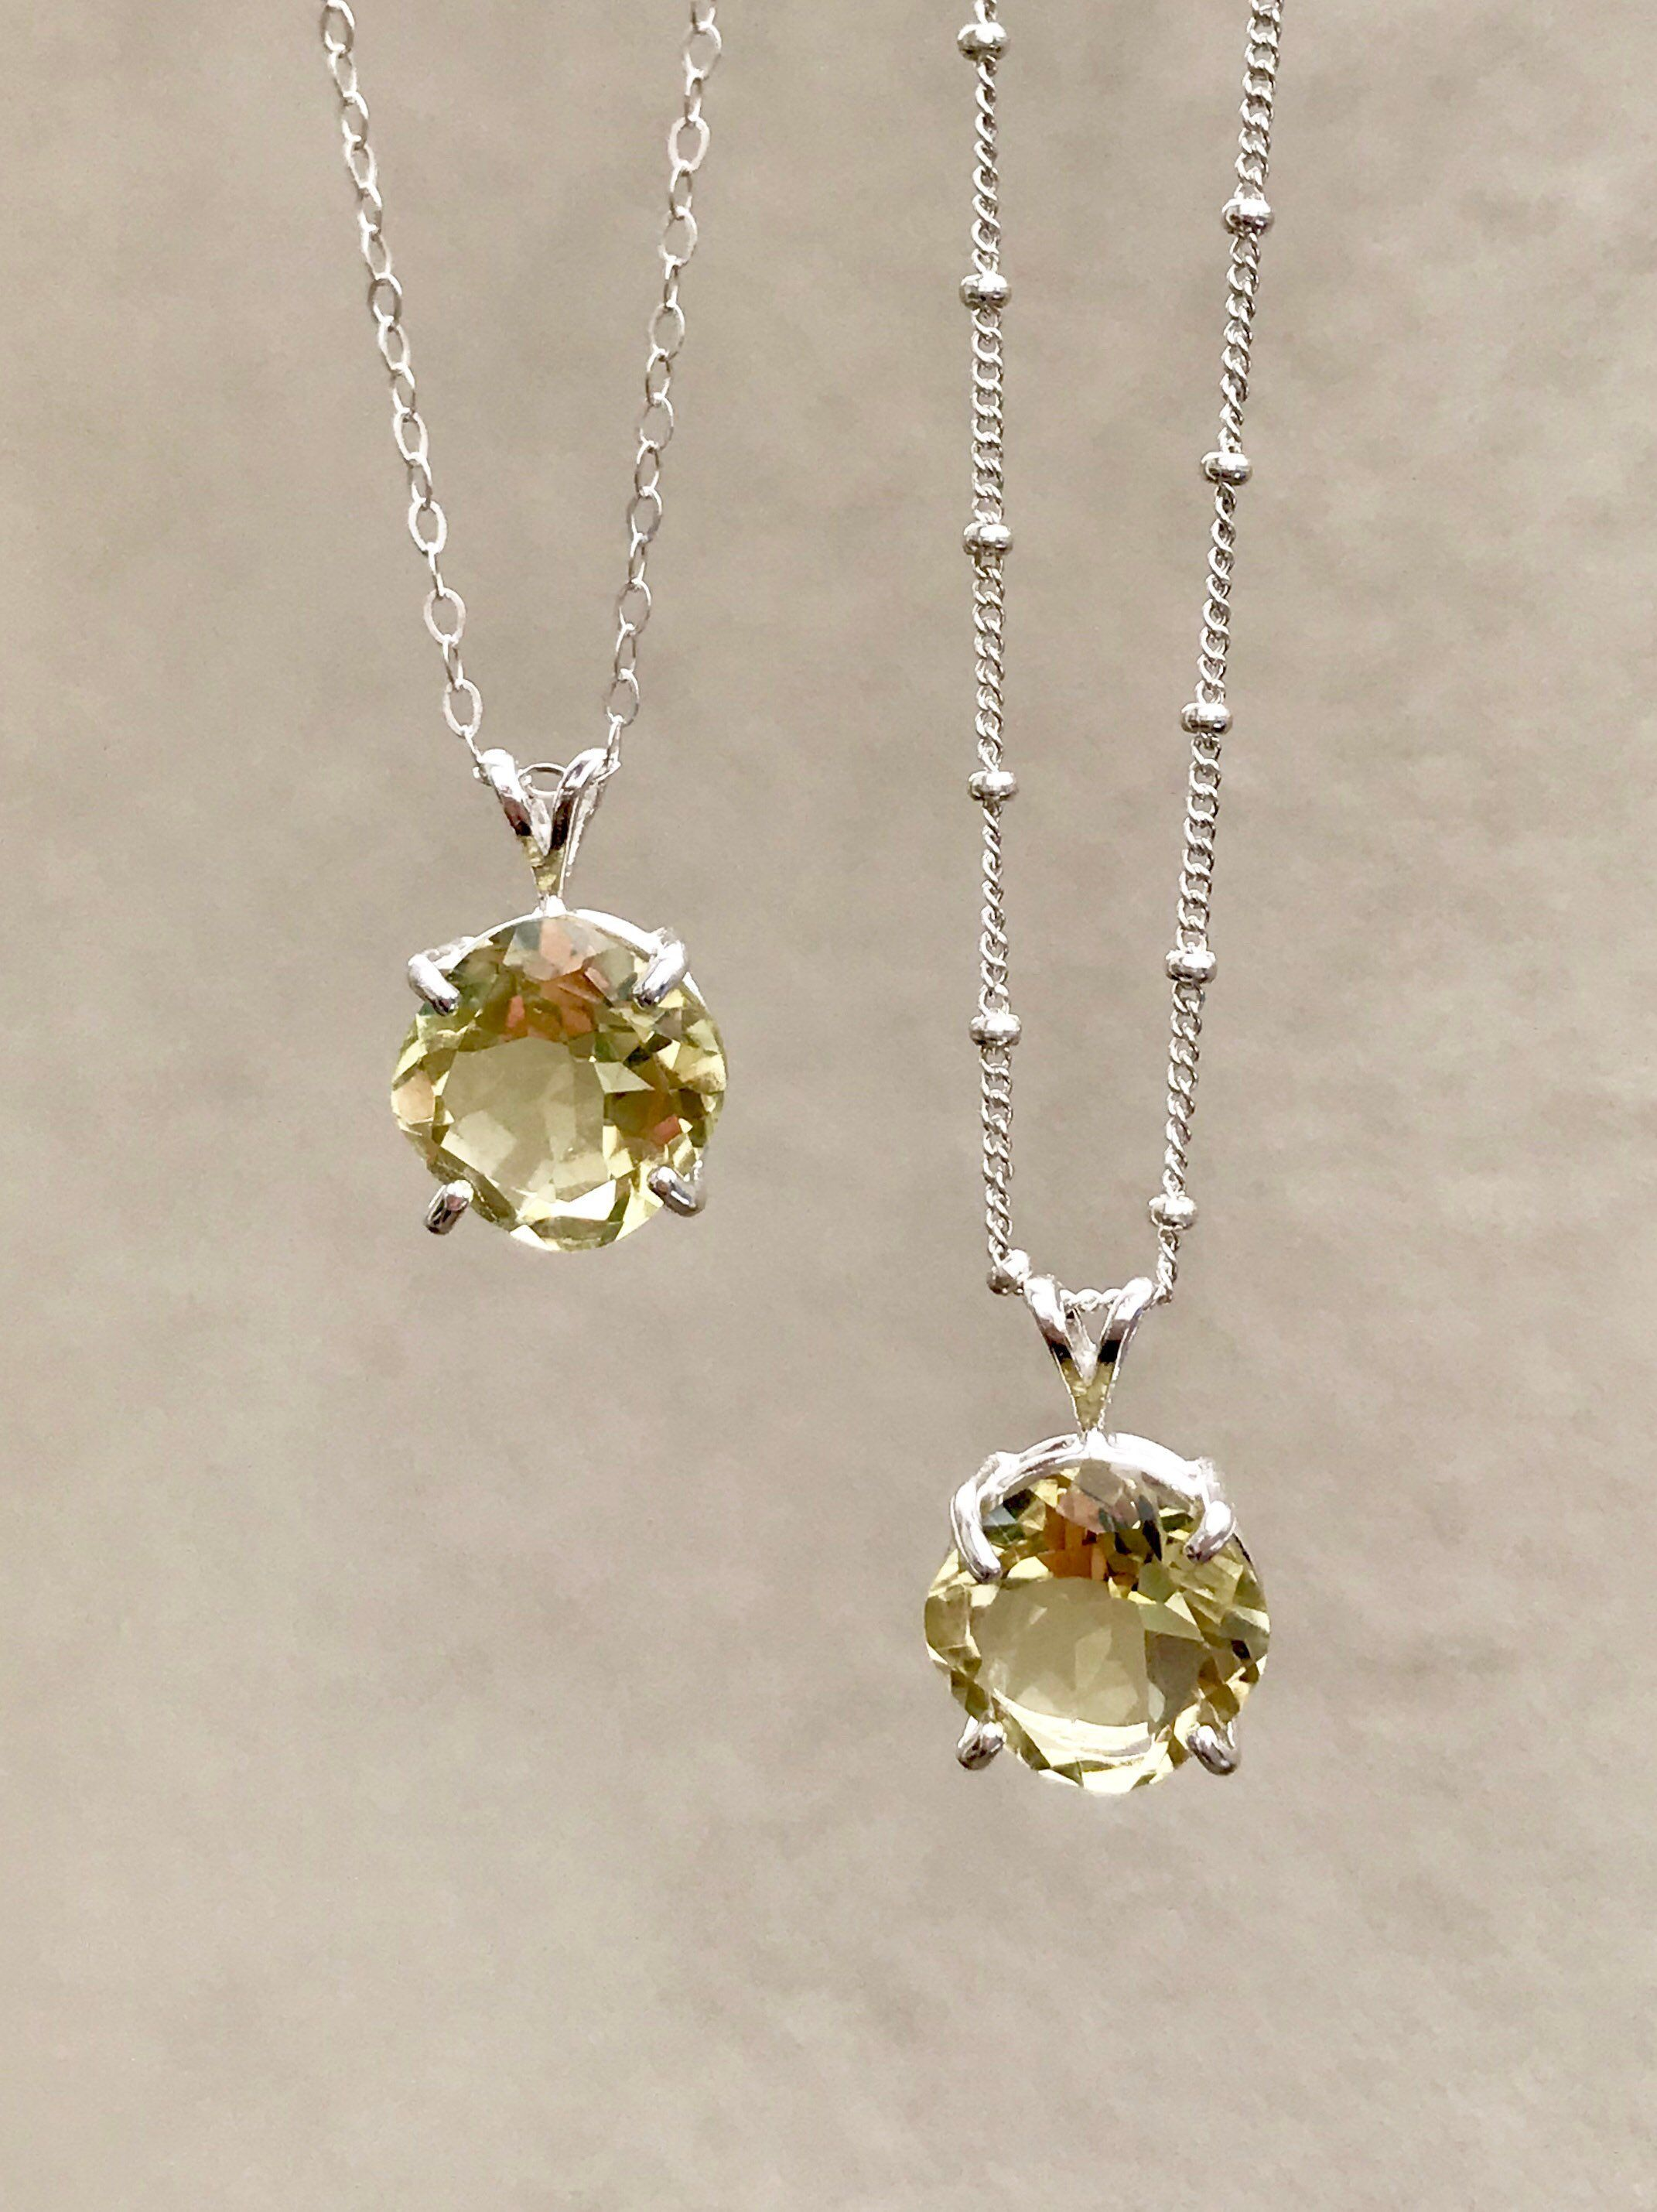 Yellow lemon quartz pendant necklace cushion cut gemstone jewelry